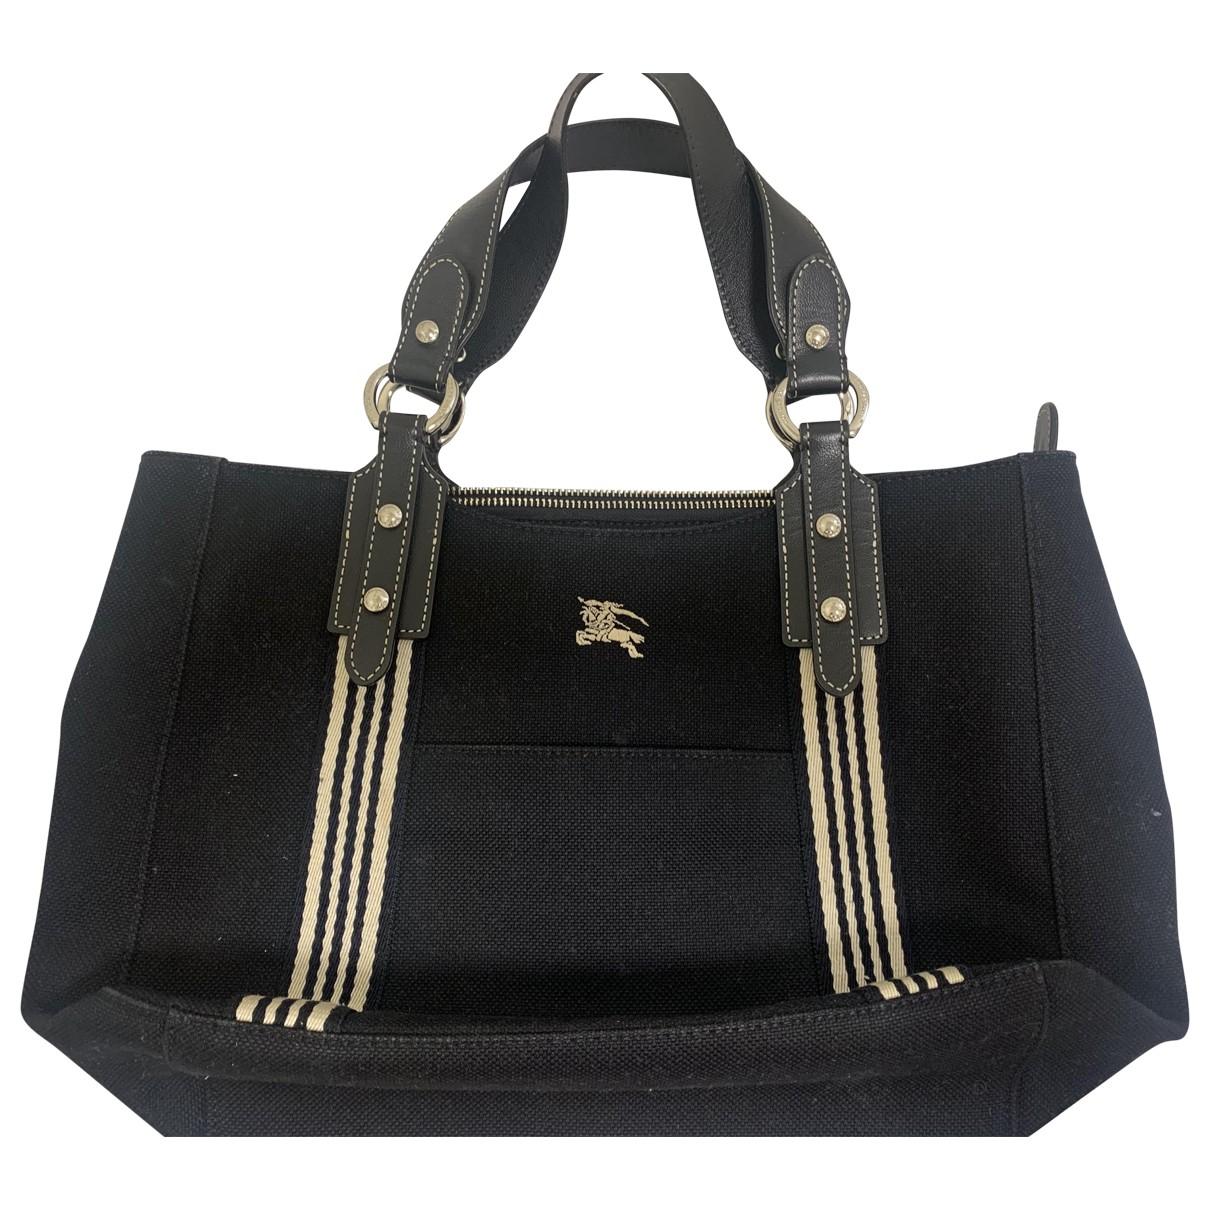 Burberry \N Black Cloth handbag for Women \N